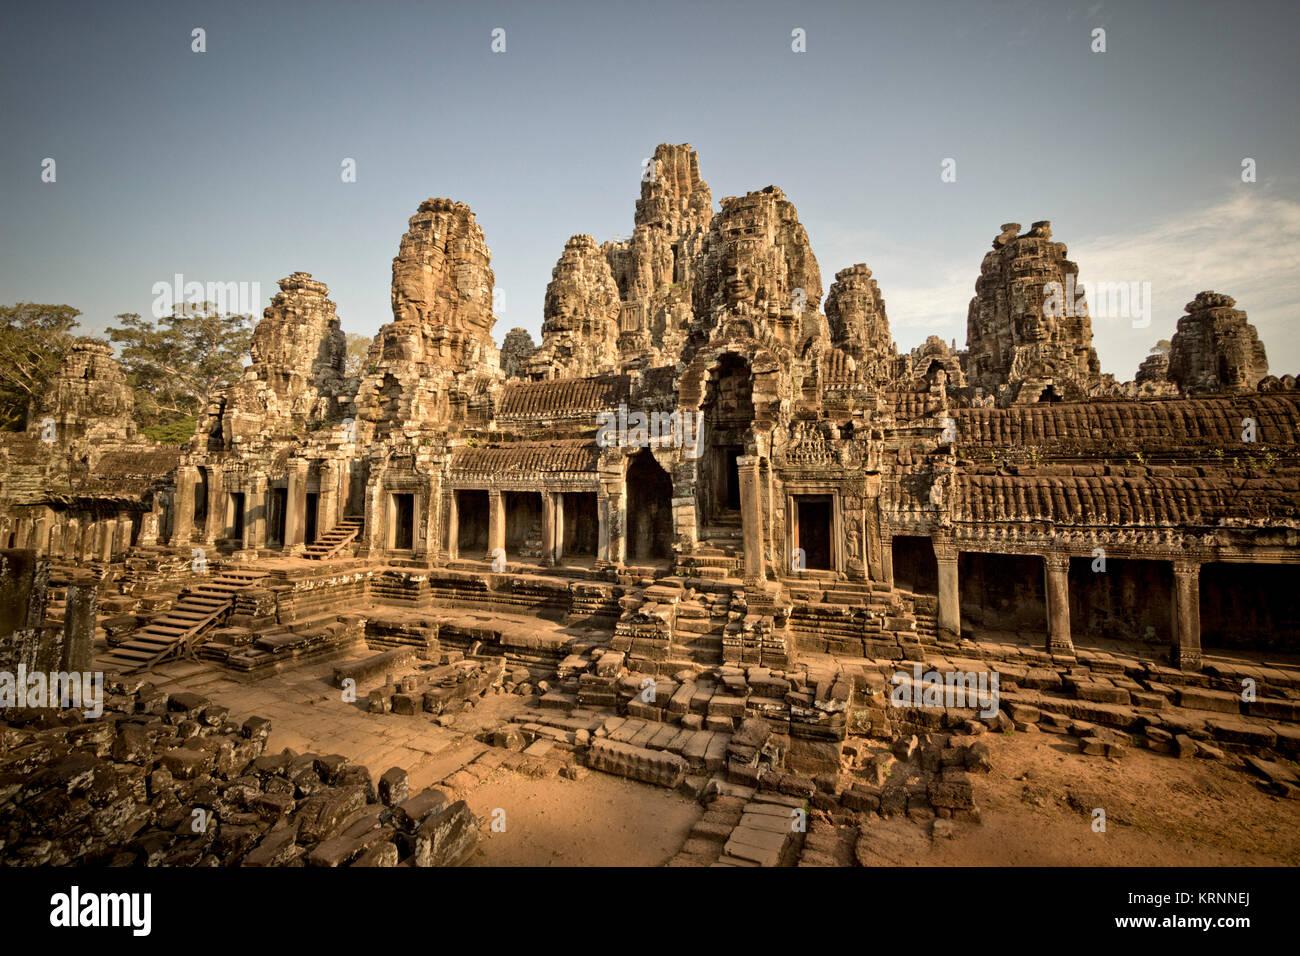 Bayon Tempel, Angkor Wat, Kambodscha, Asien, Stockbild